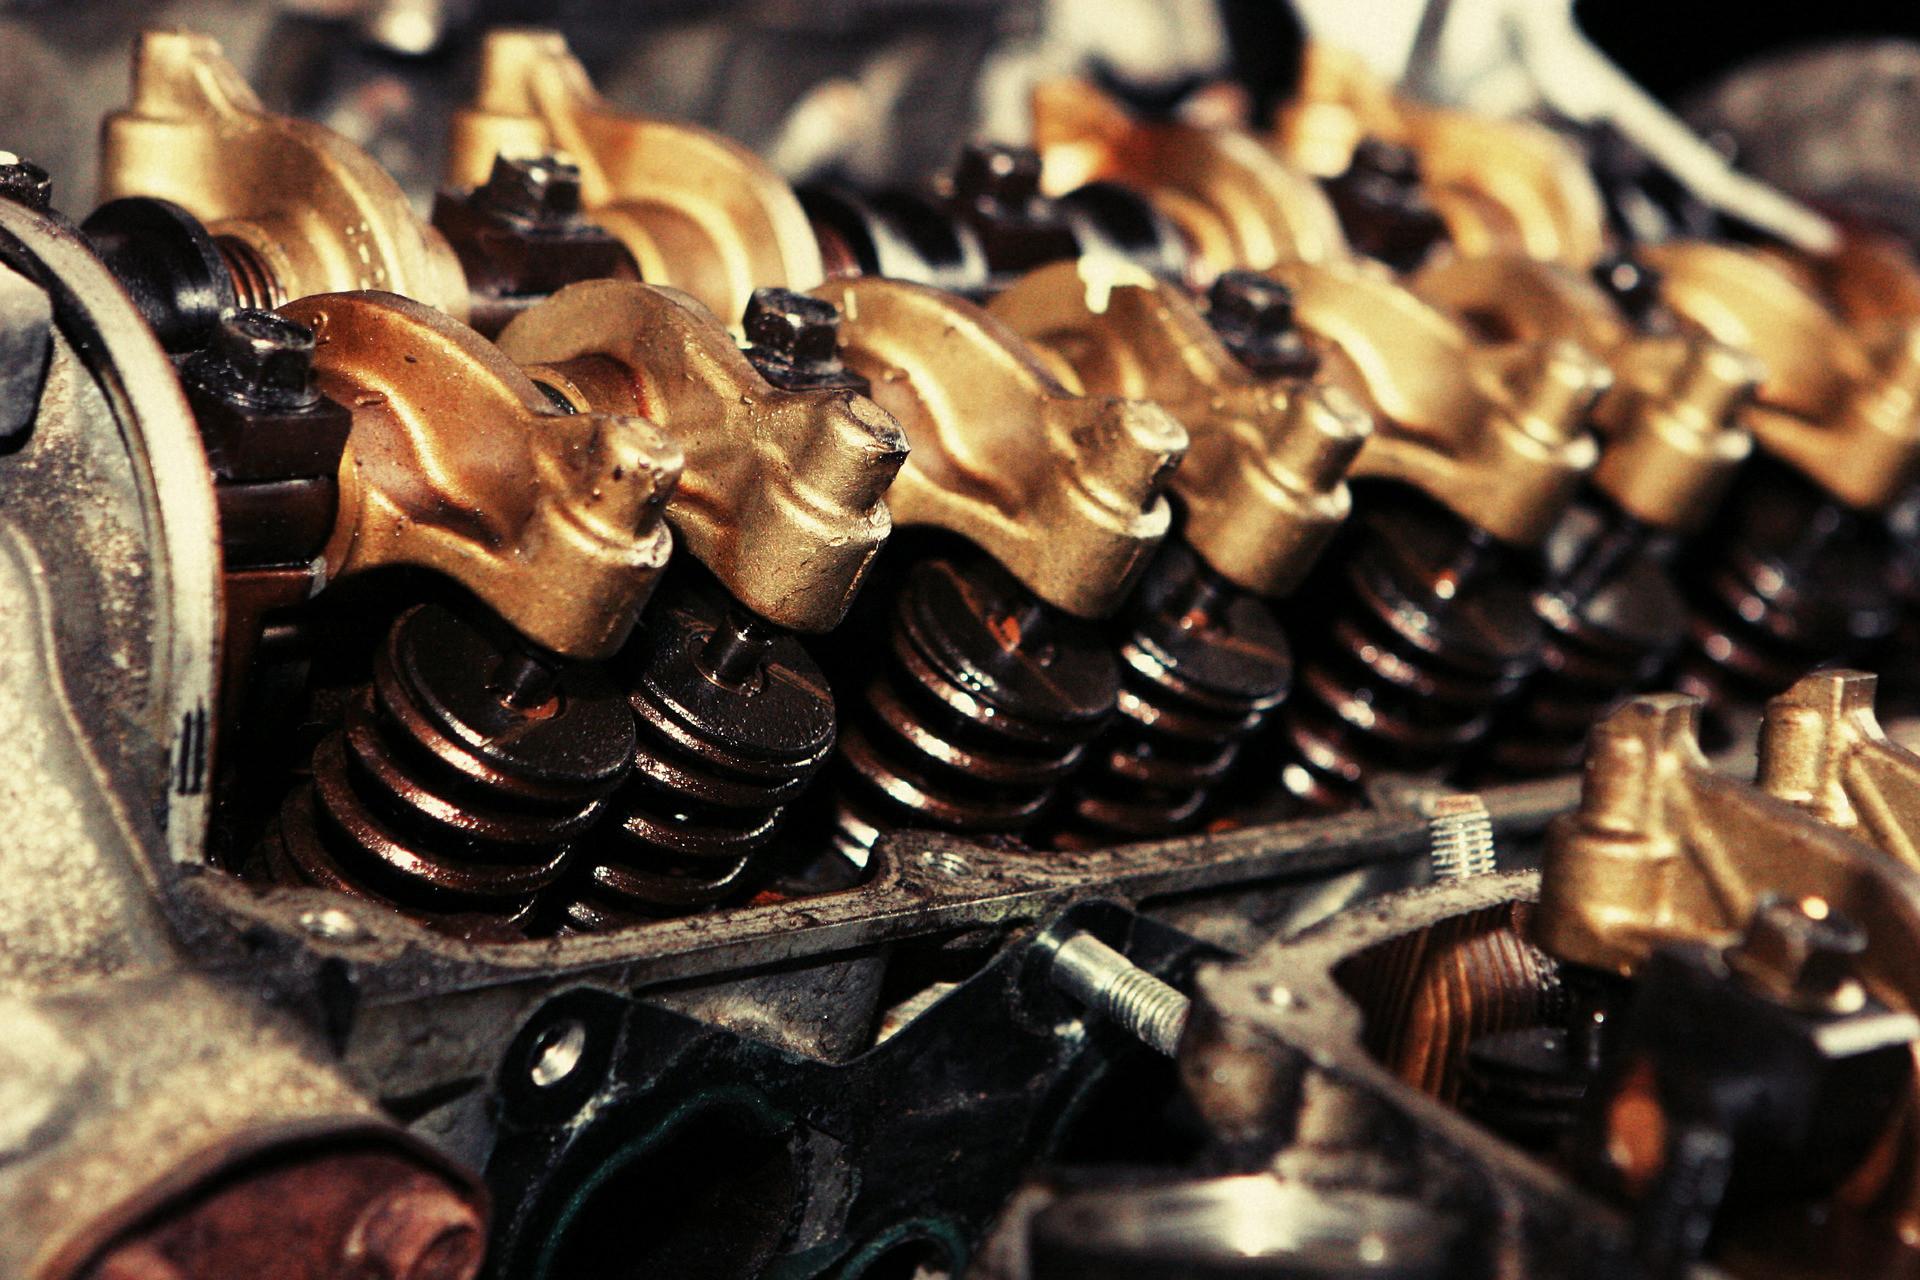 Motorspülung Optional Service